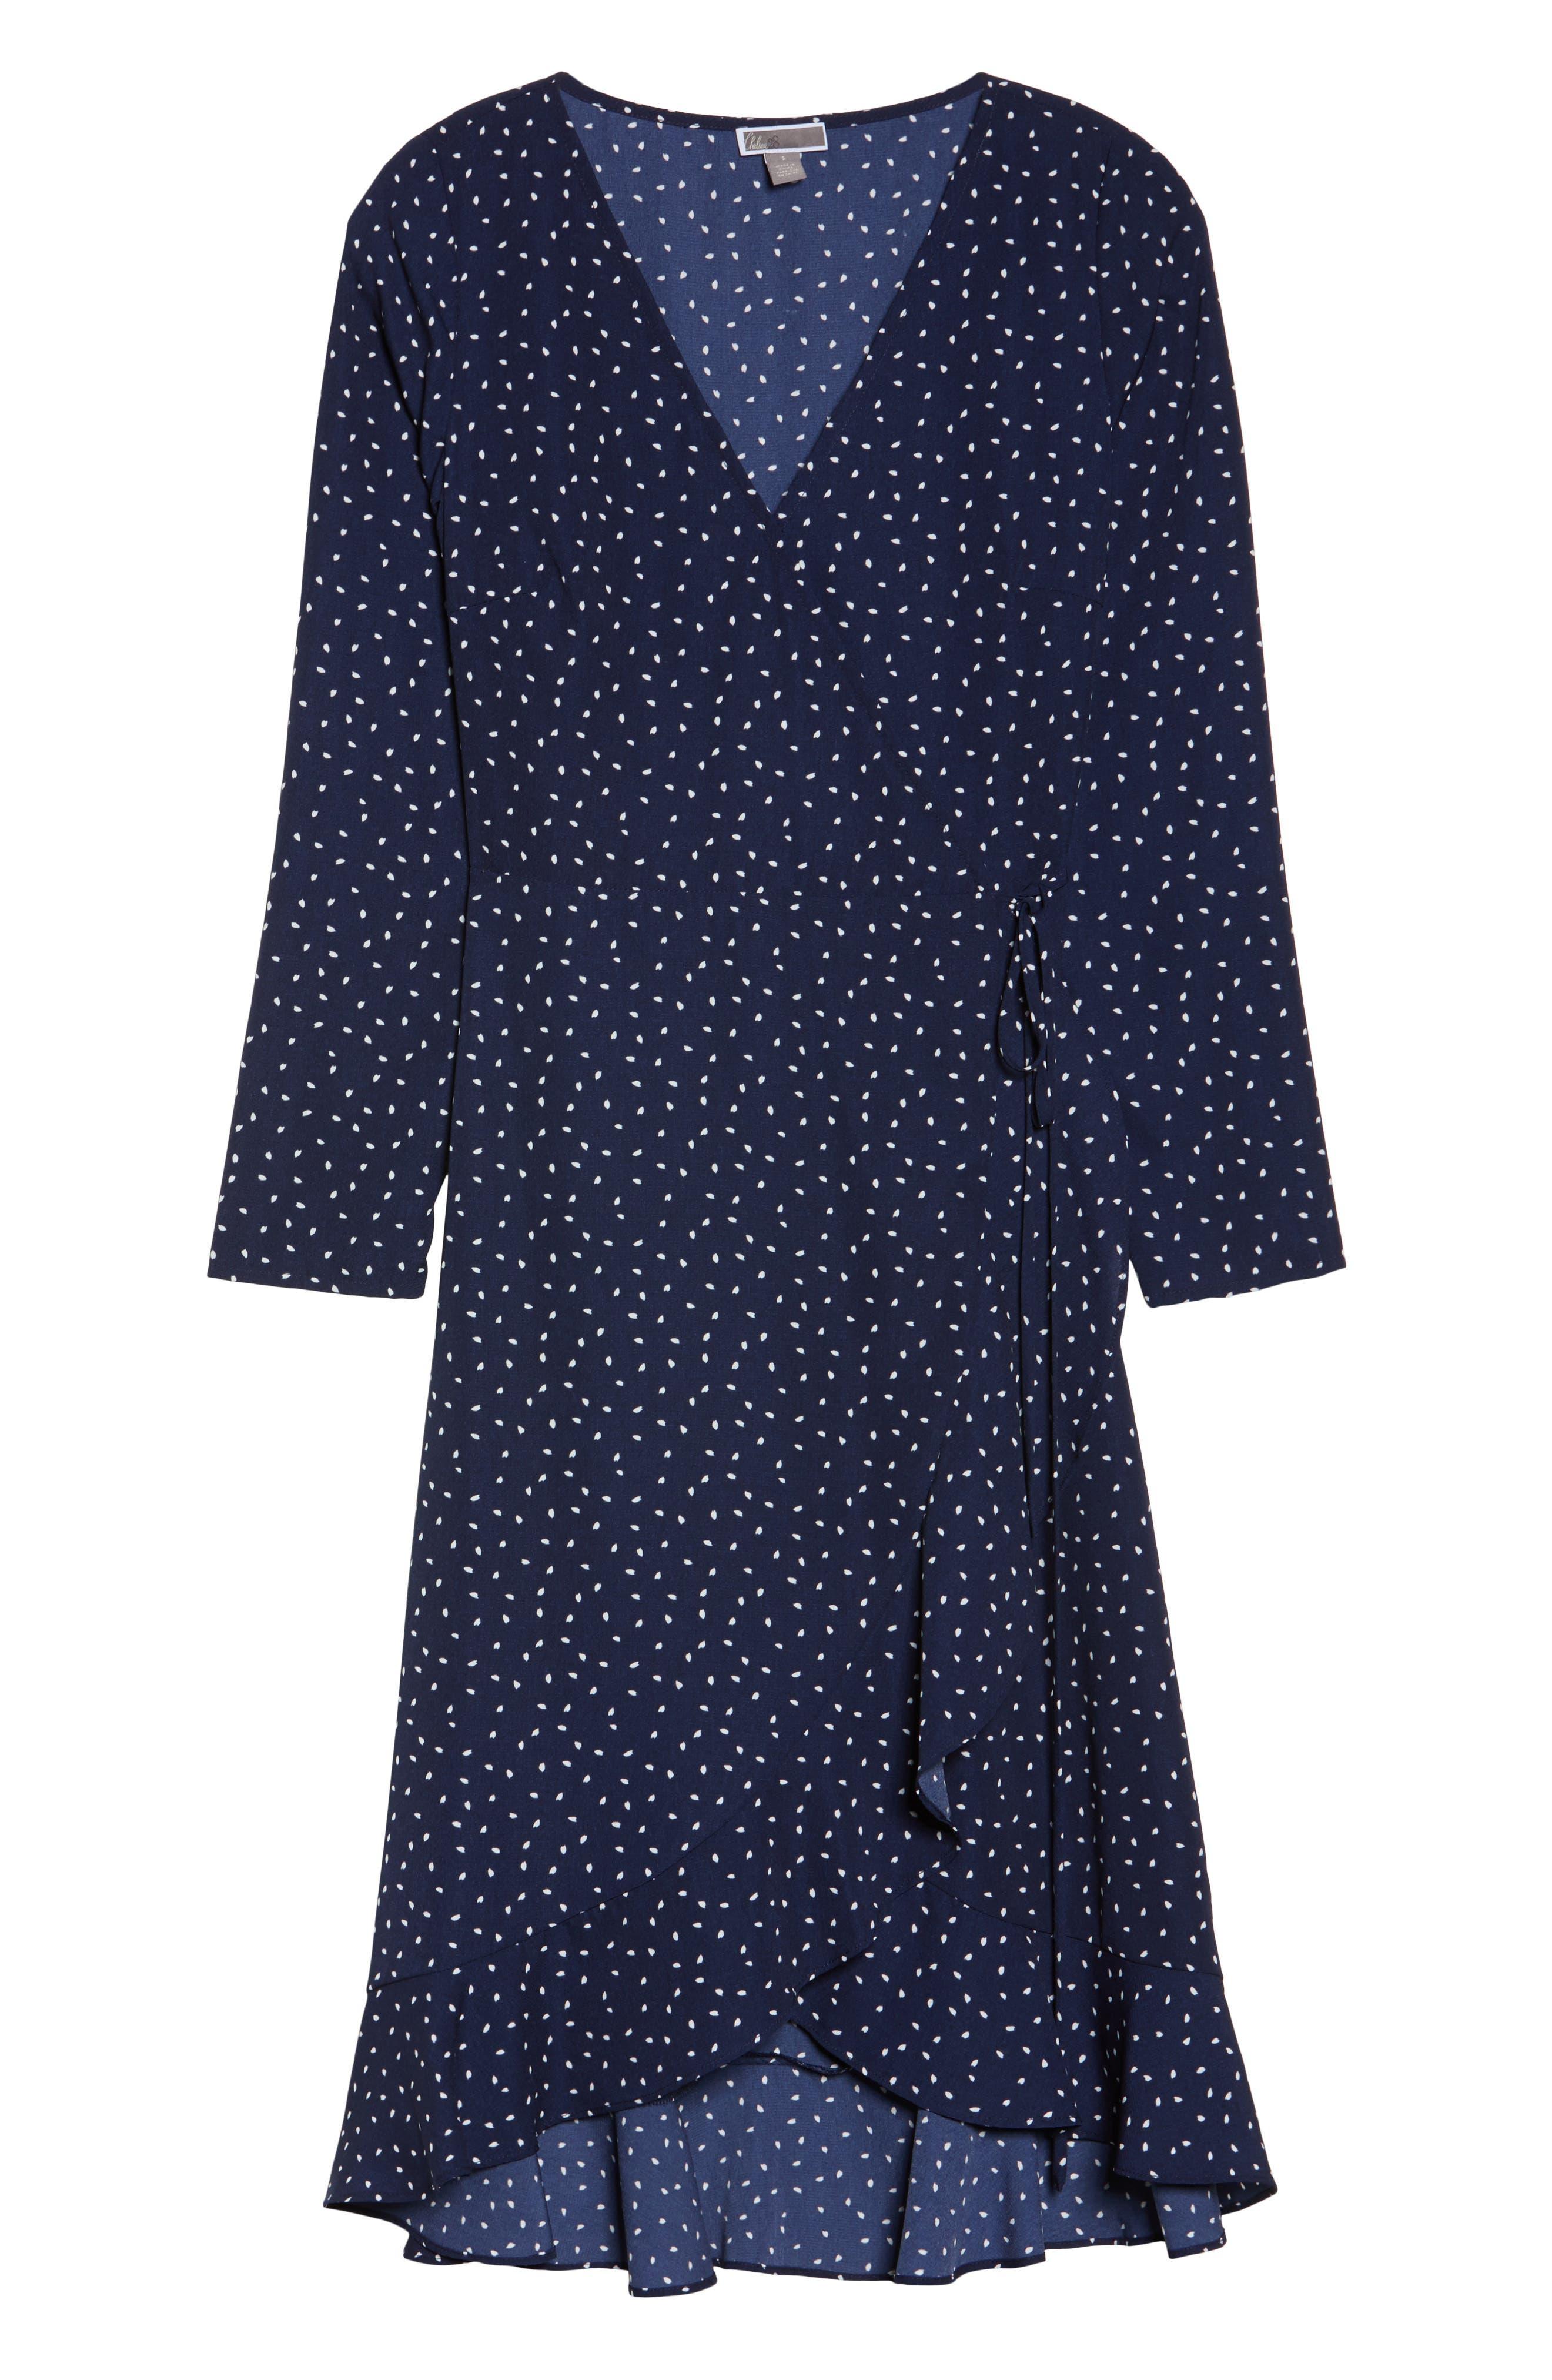 Print Wrap Dress,                             Alternate thumbnail 6, color,                             Small Mixed Dot